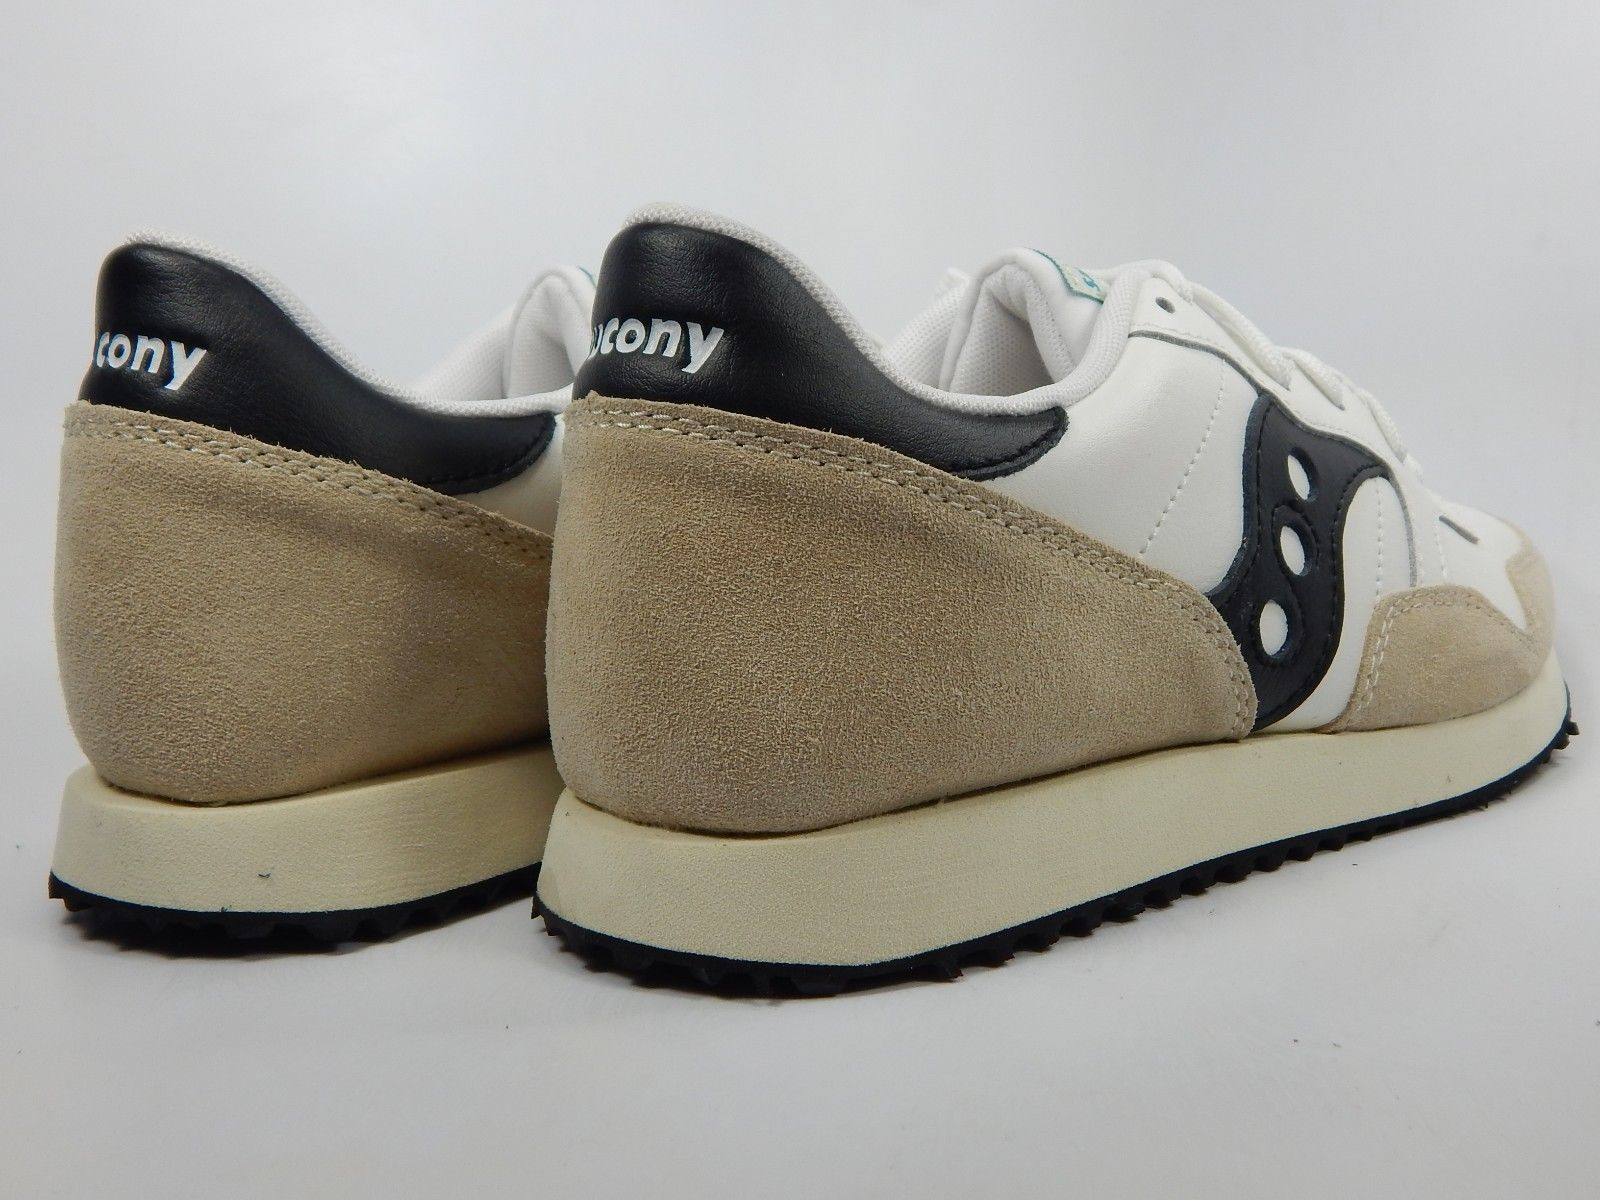 Saucony Originals DXN Trainer CL Men's Running Shoes Sz 9 M (D) EU 42.5 S70358-4